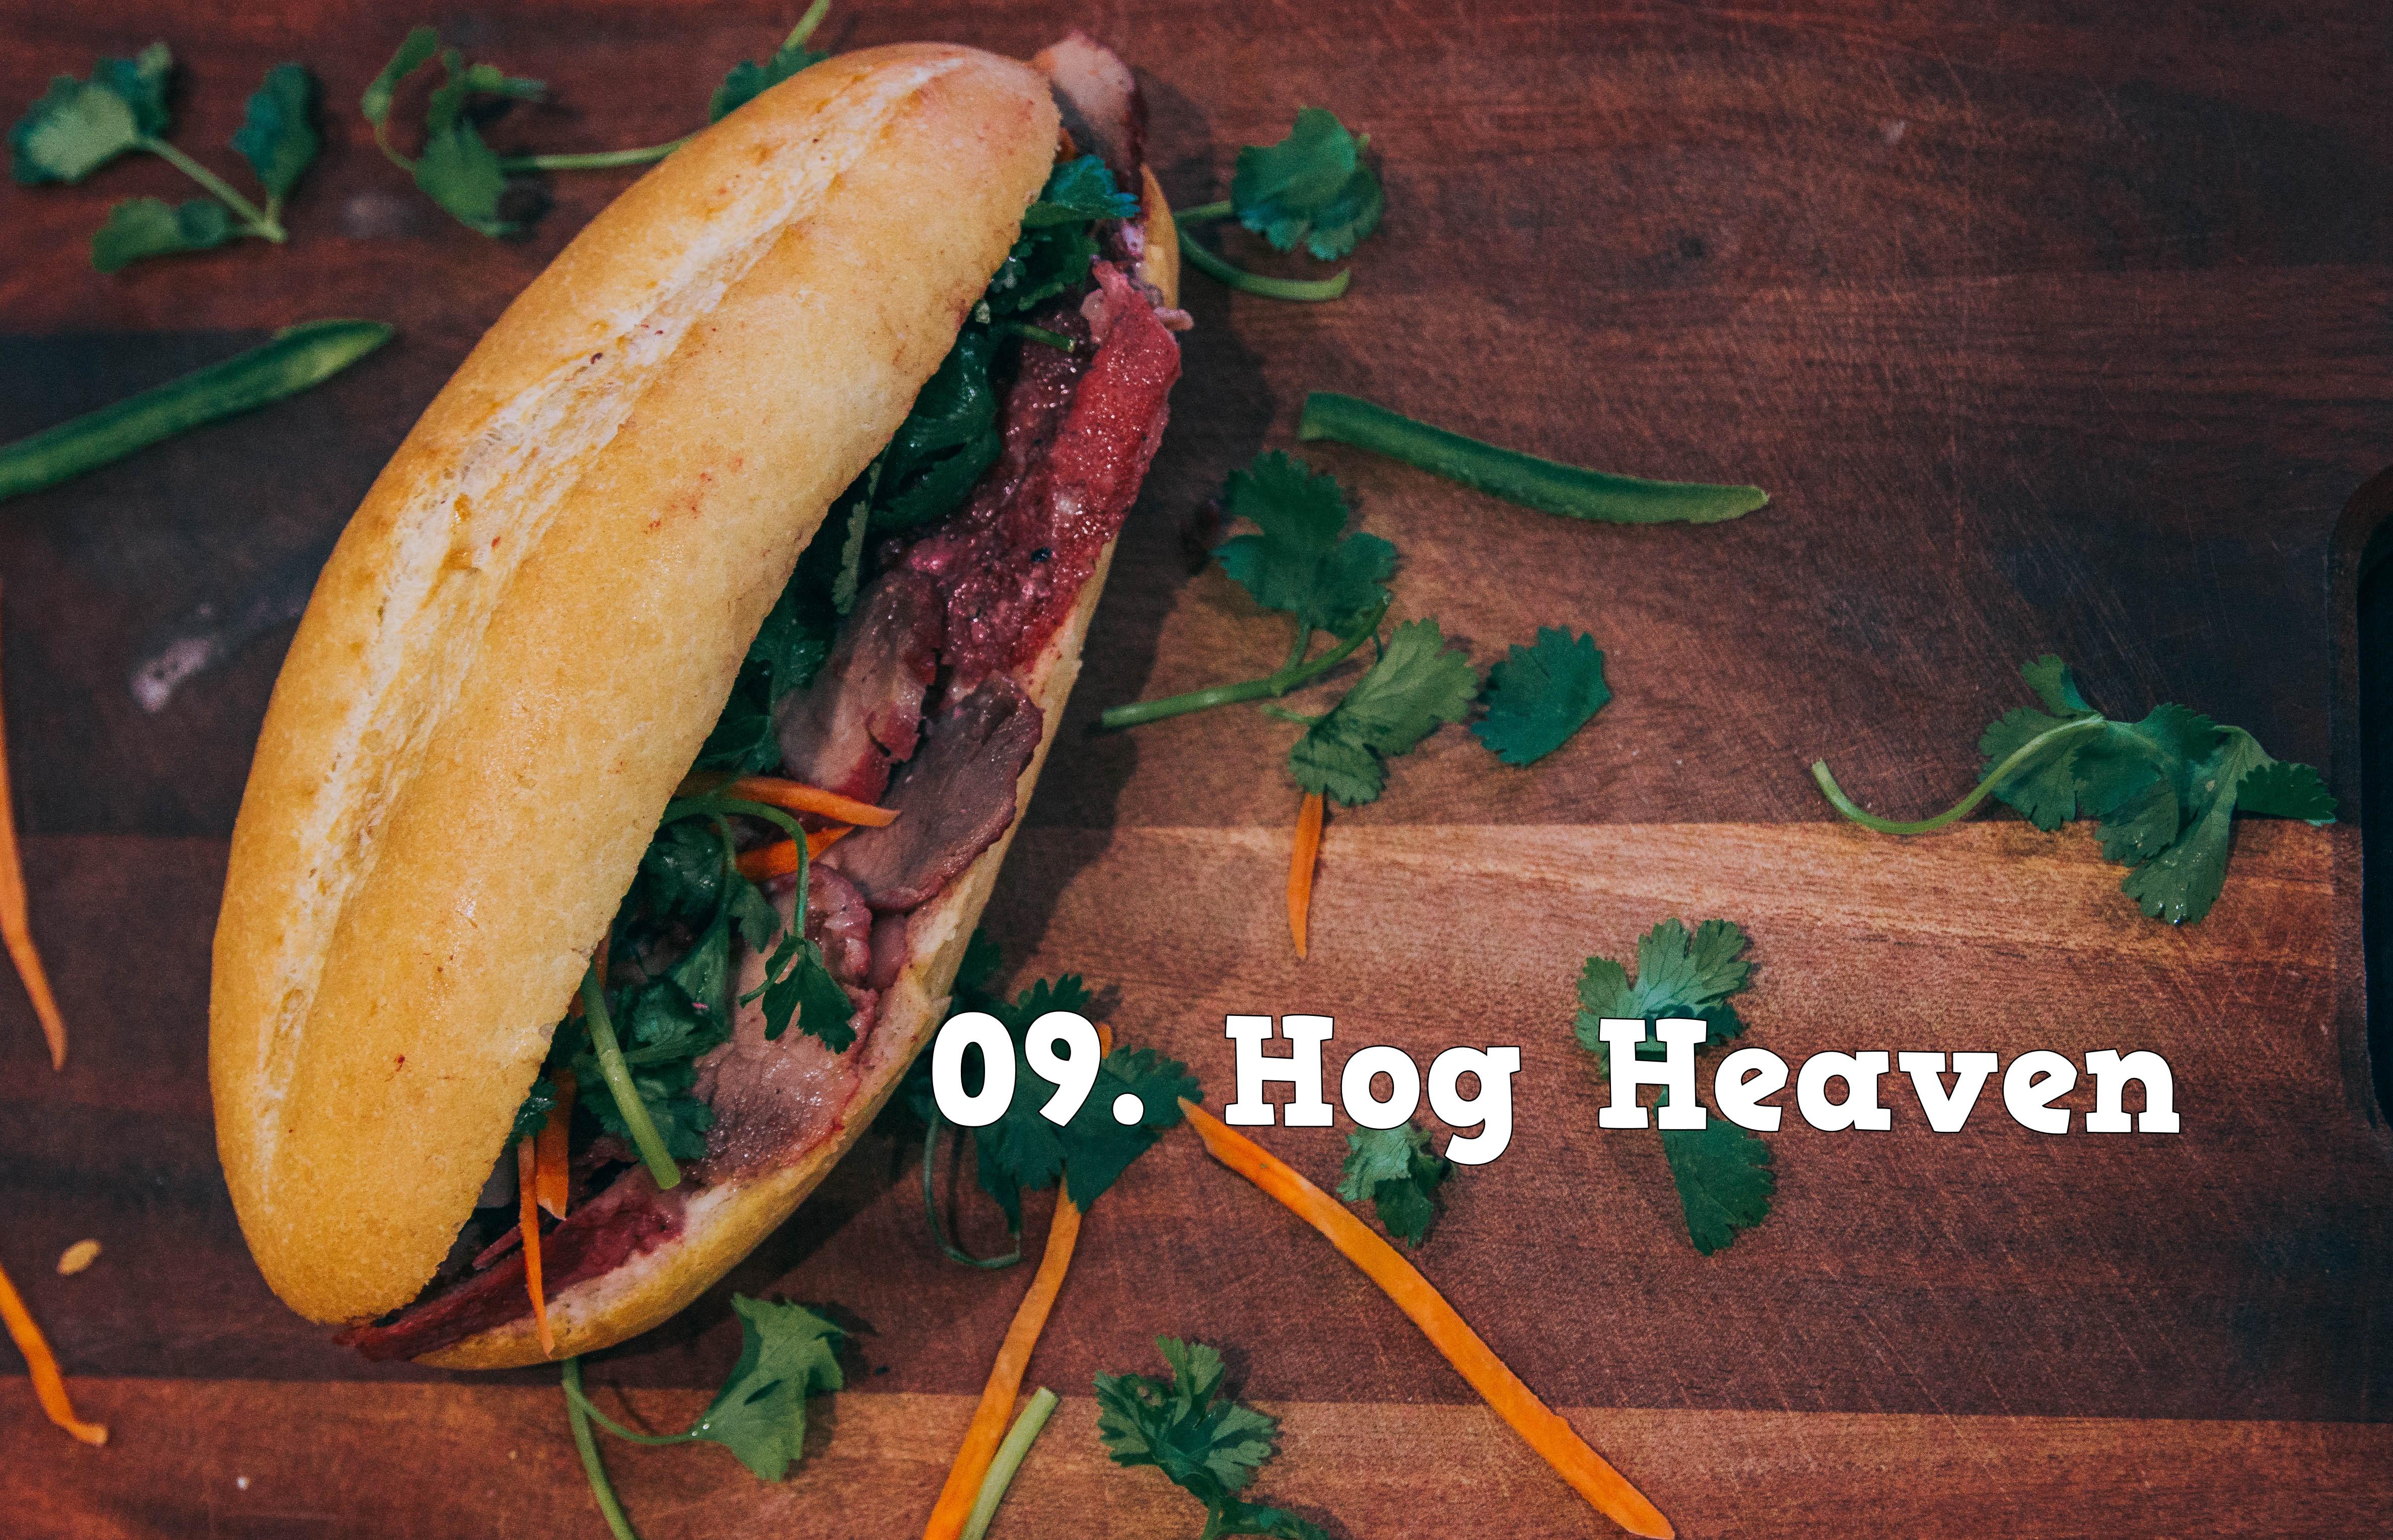 09.Hog Heaven